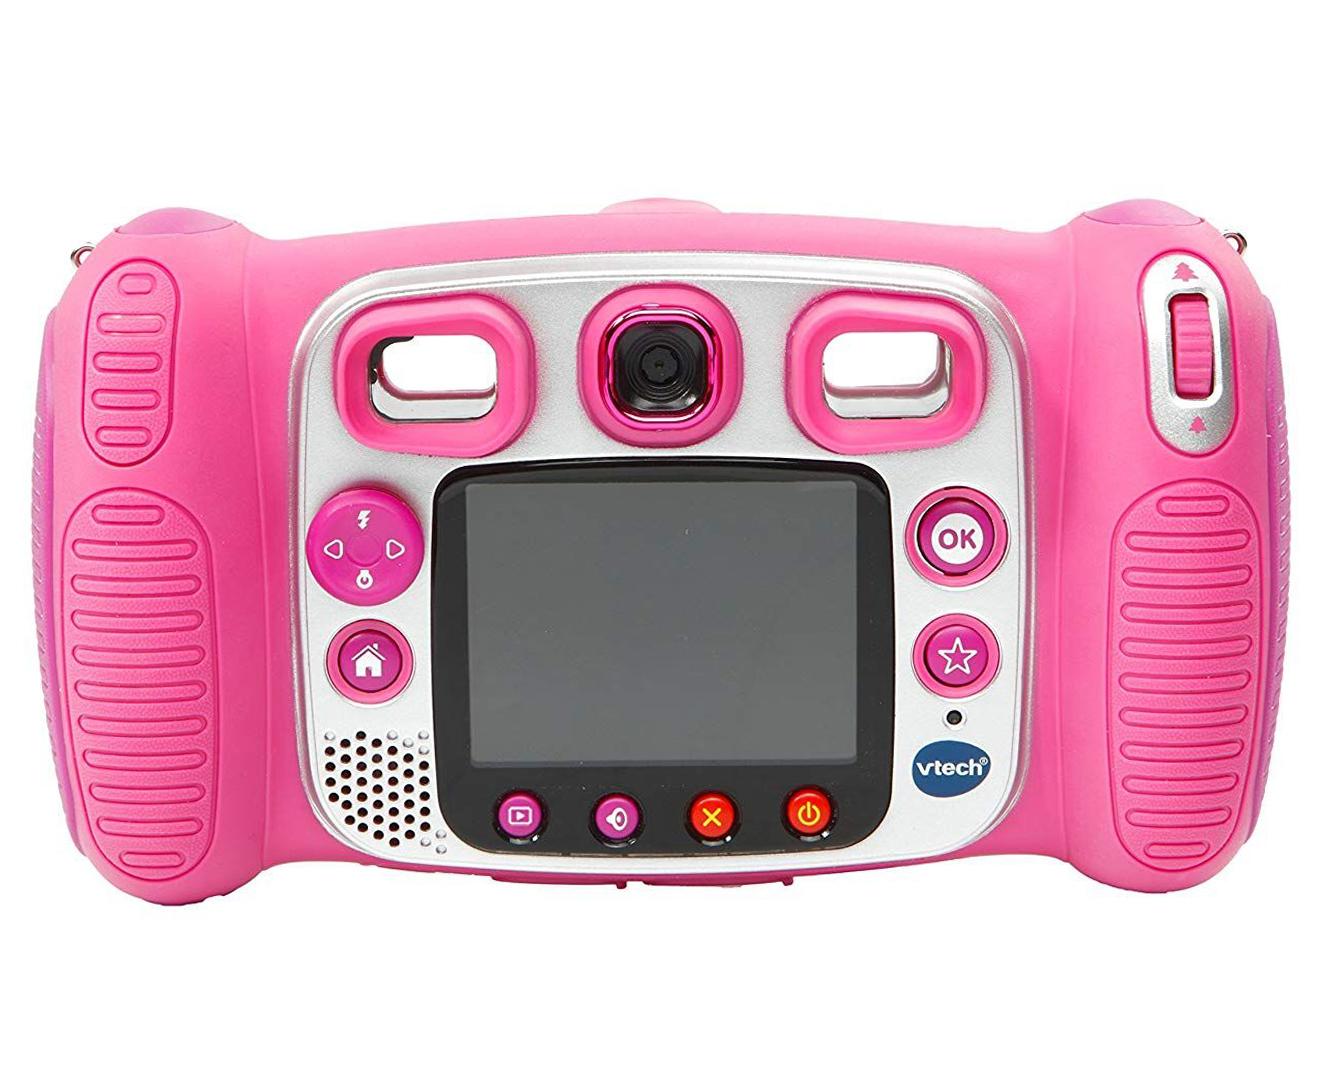 f3bcb7e5fa8ef9 VTech Kidizoom Duo 5.0 Digital Camera - Pink